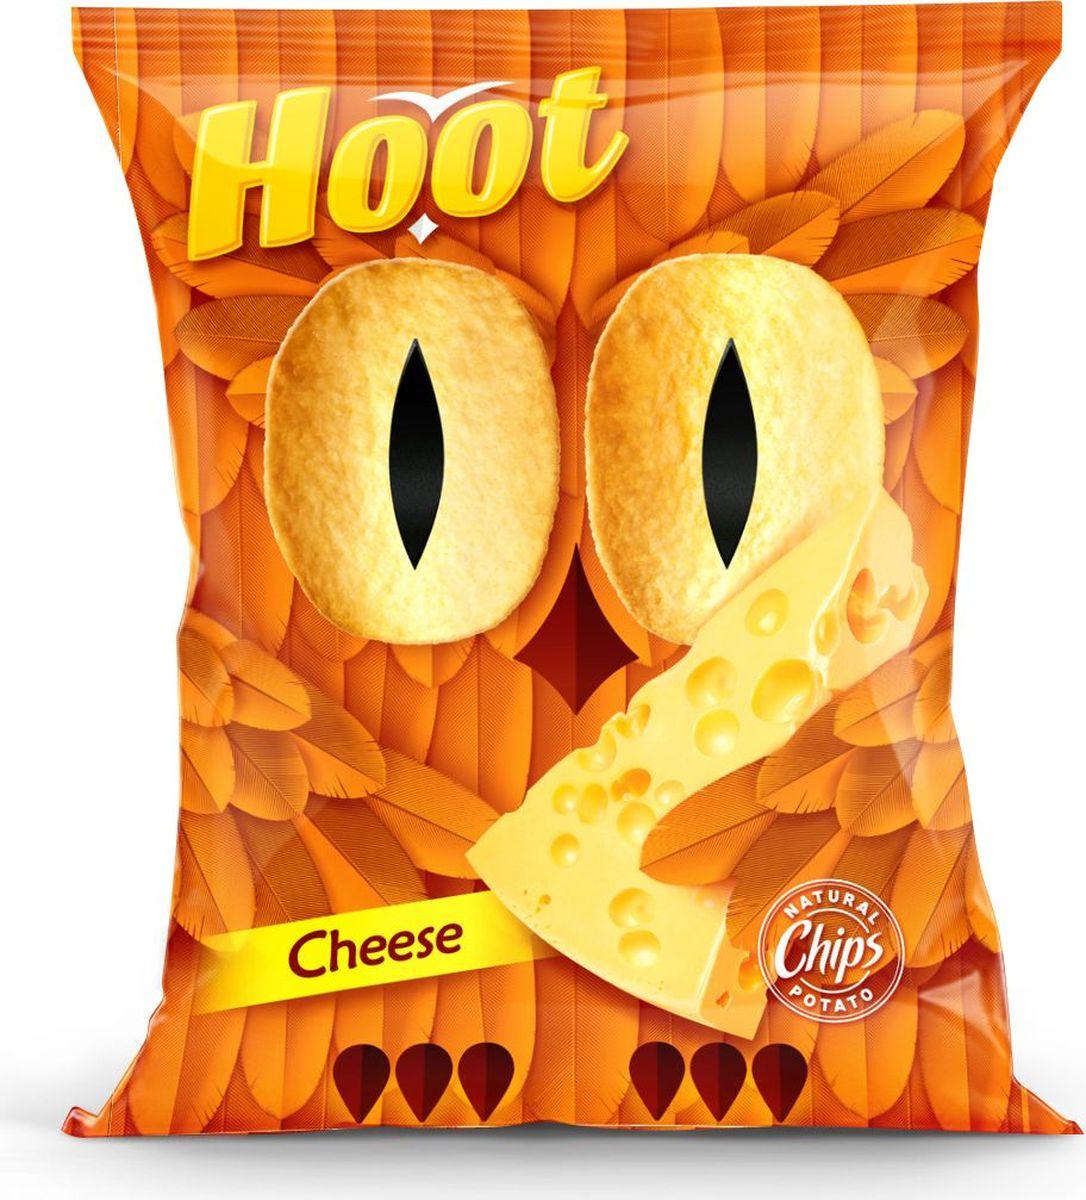 Hoot Чипсы, сыр, 150 г